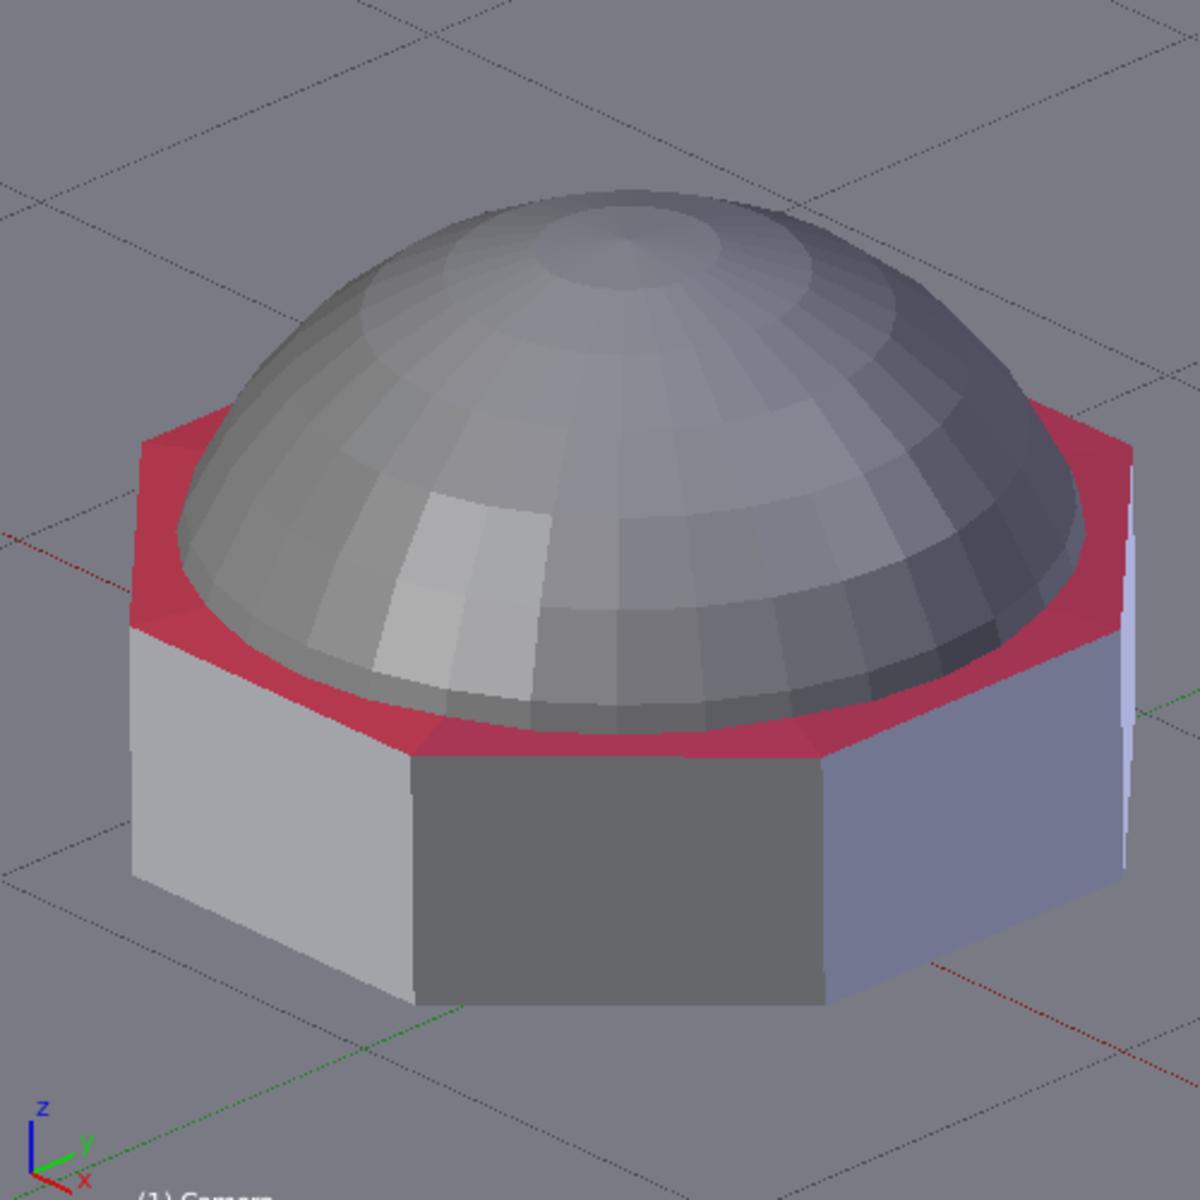 Figure E: The finished dome.